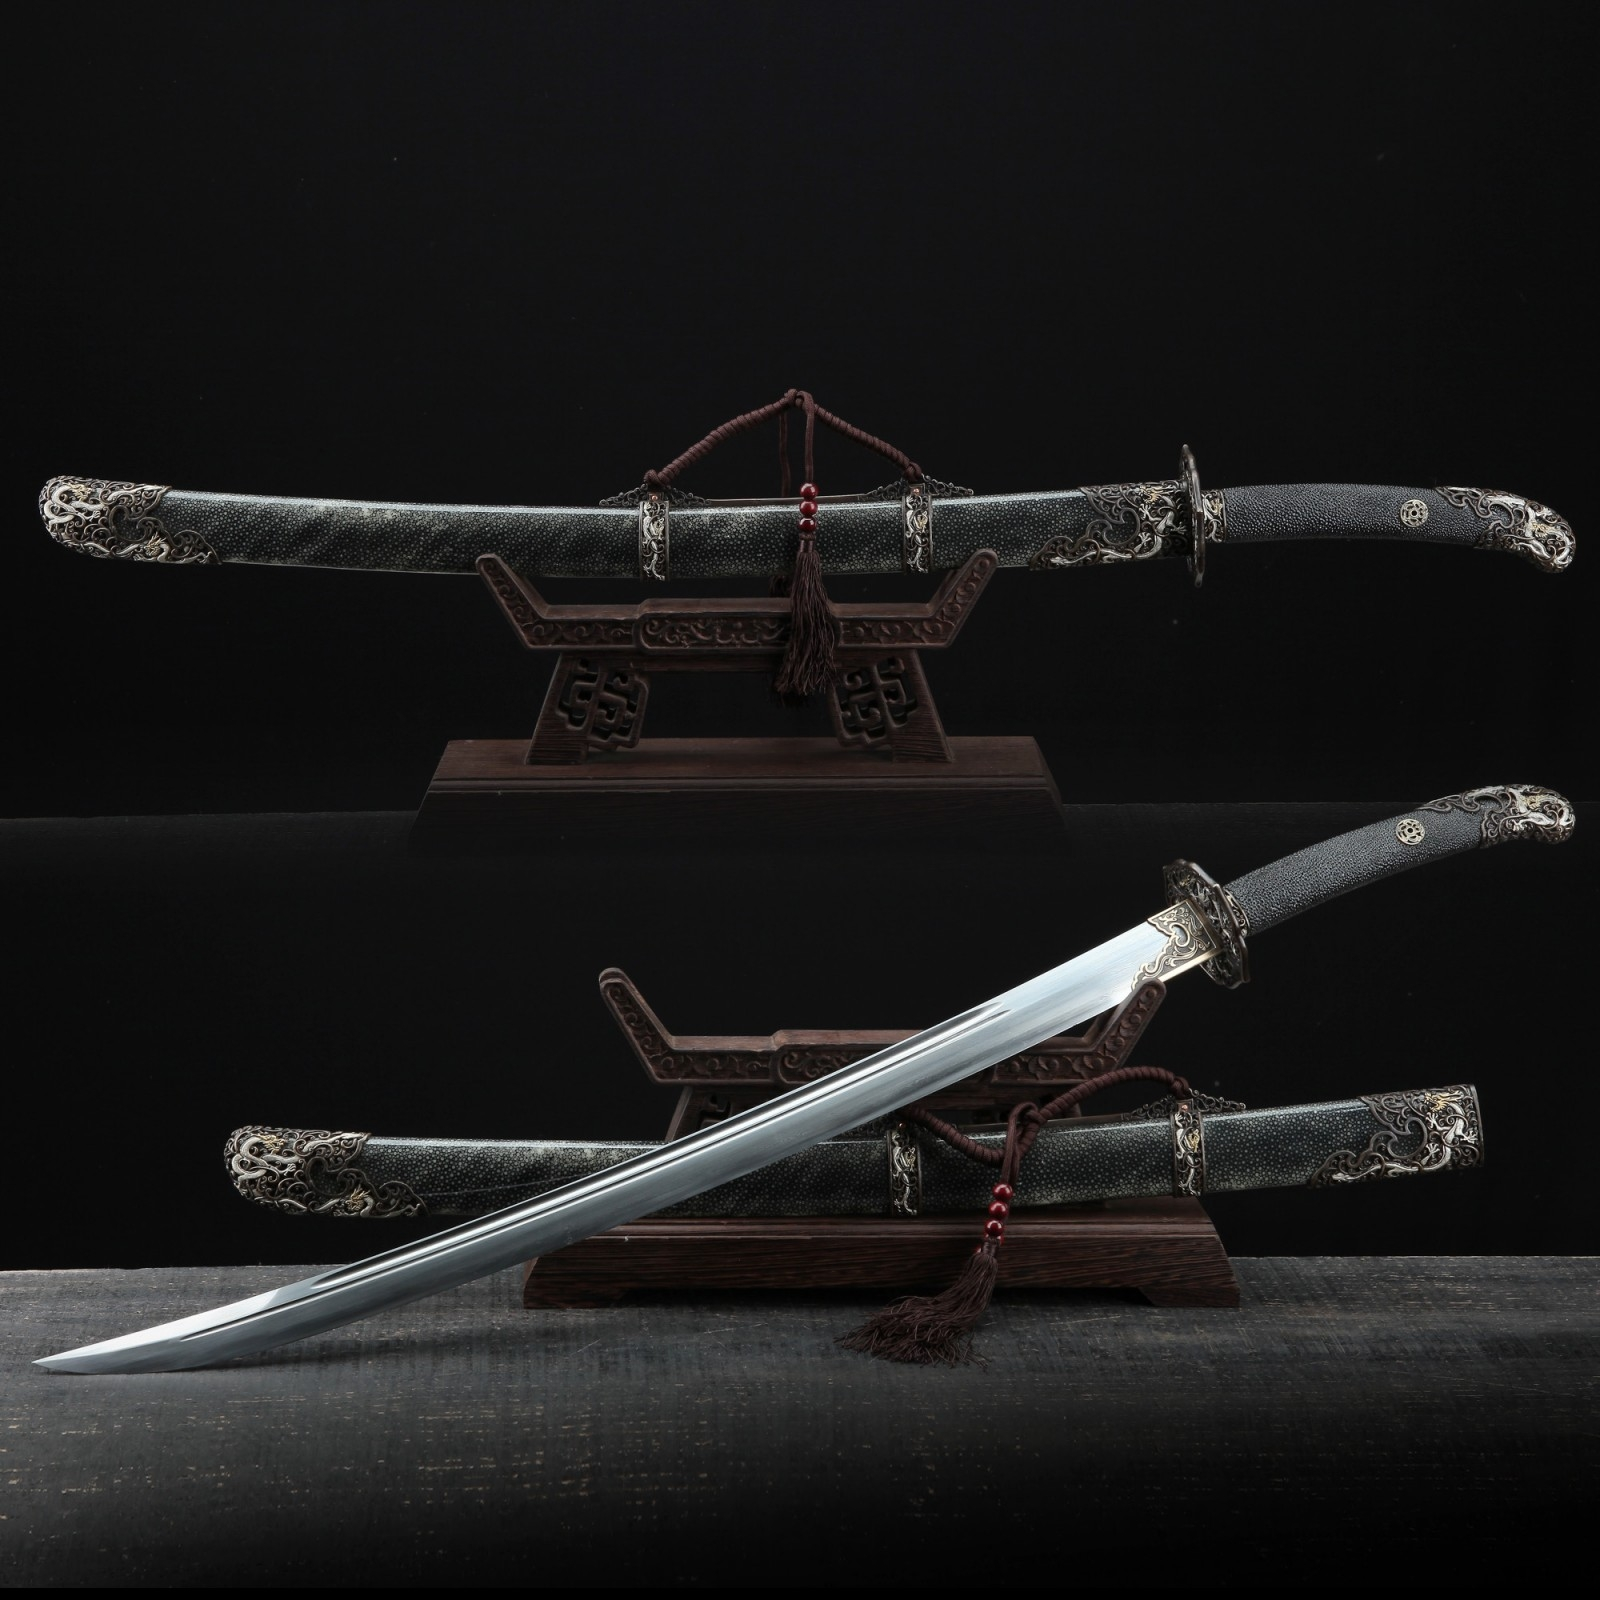 Handmade Chinese Qing Dynasty Real Rayskin Clay Tempered Real Hamon King Swords